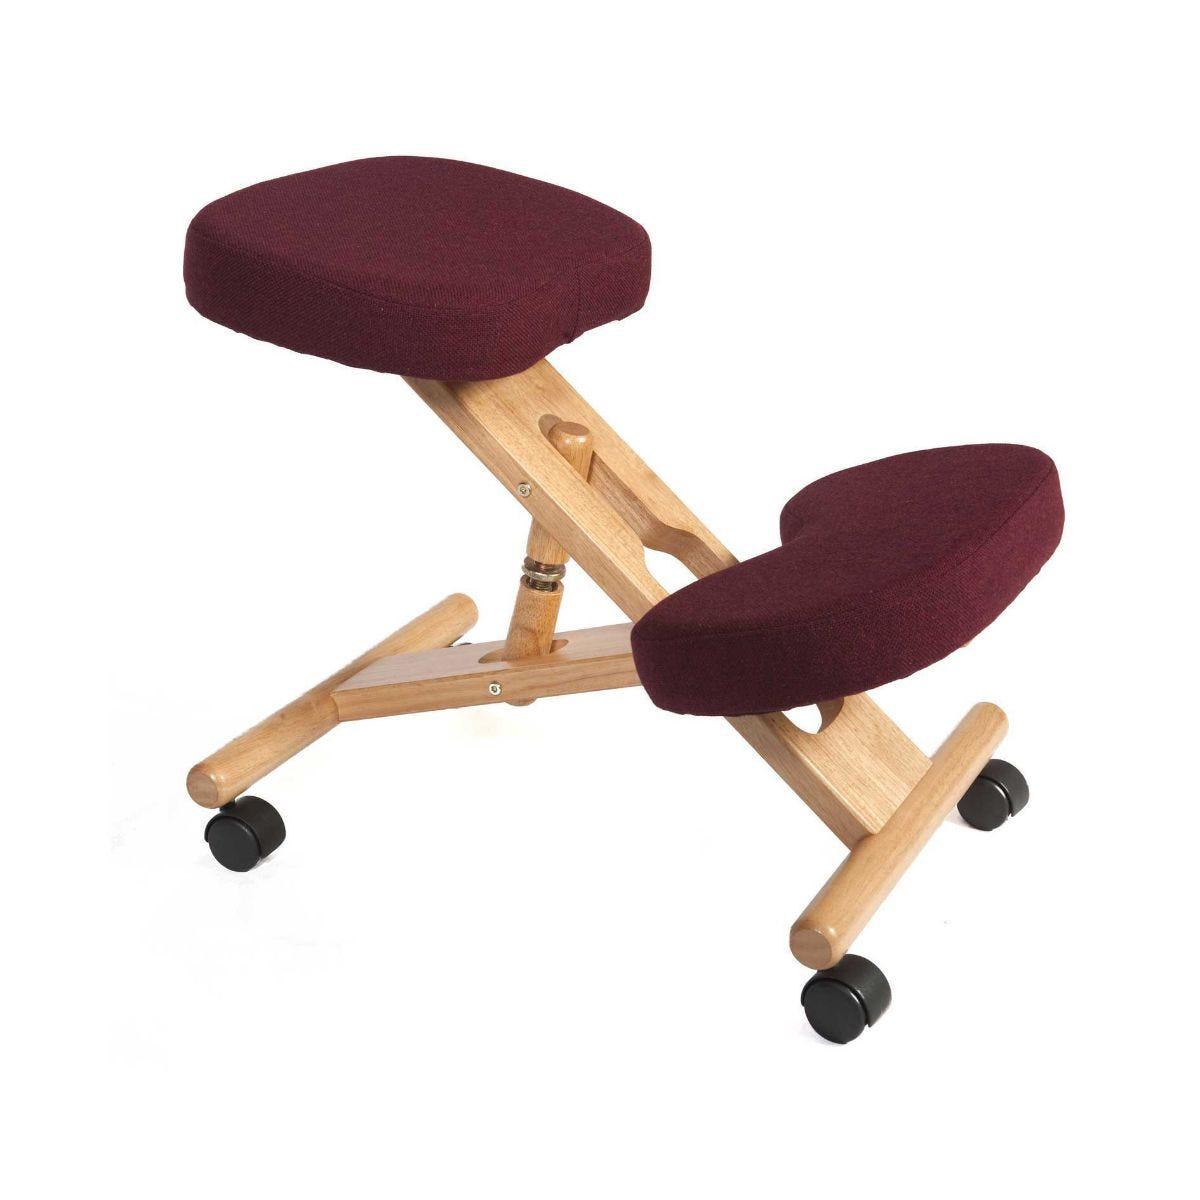 Orthopedic fice Chairs & Seating Furniture & Storage Ryman